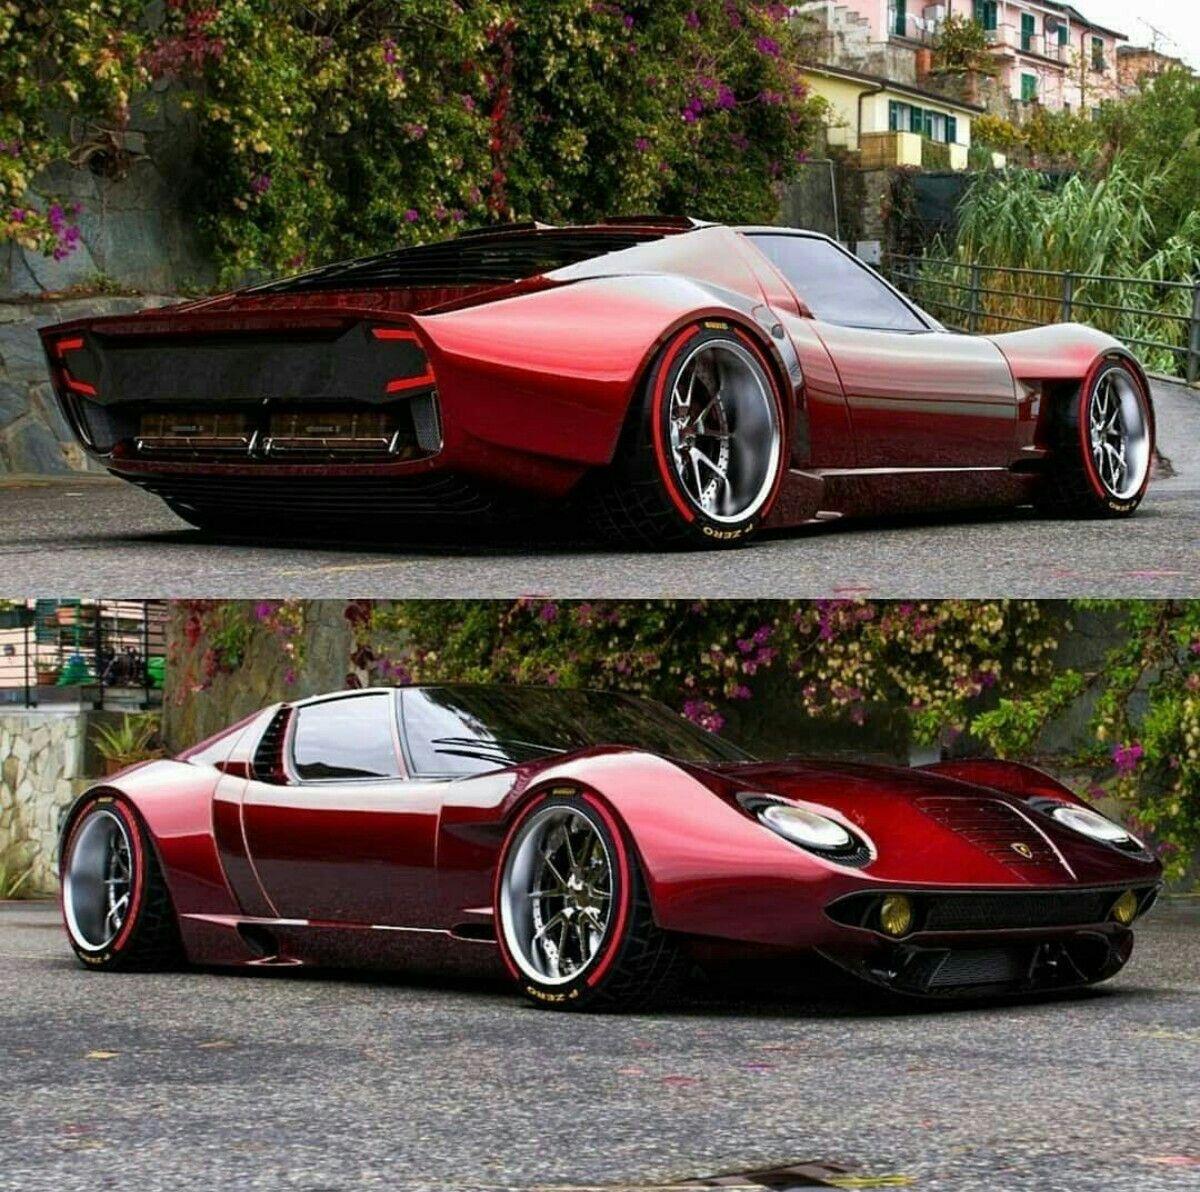 Lamborghini Miura Fr In 2020 Sports Cars Luxury Lamborghini Miura Best Lamborghini